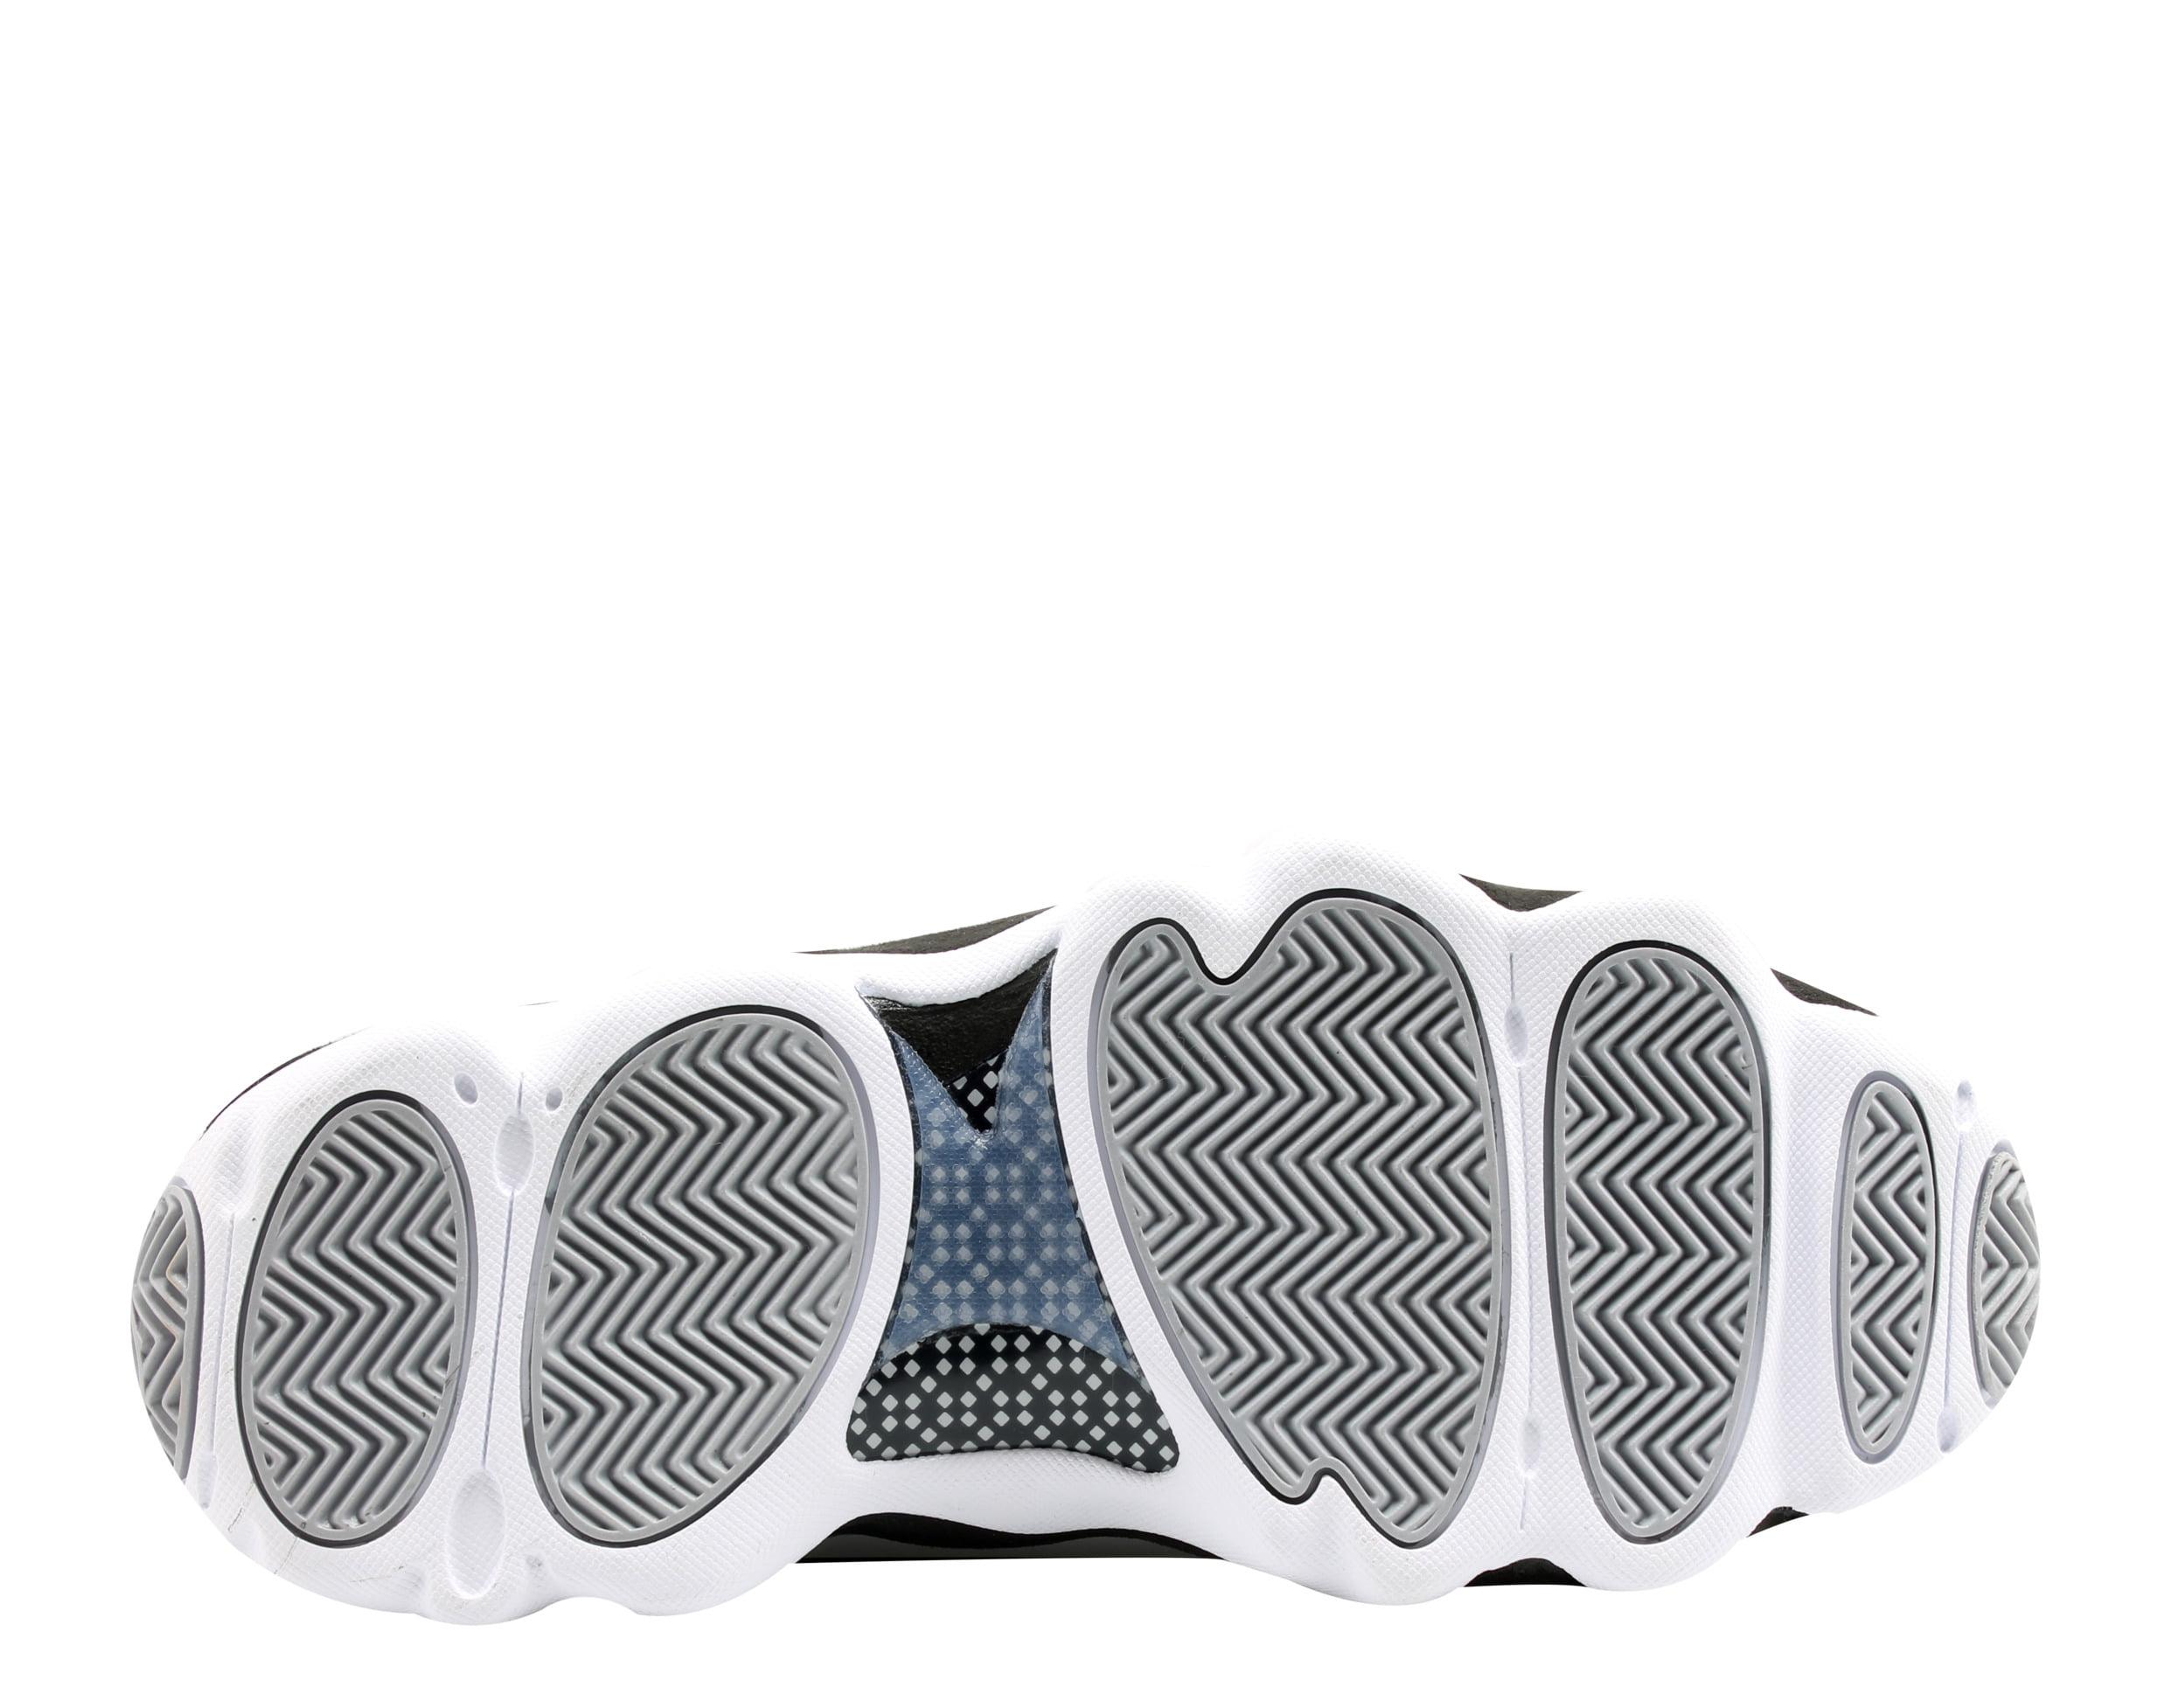 Mens Air Jordan Pro Strong Wolf Grey Black White 407285-013